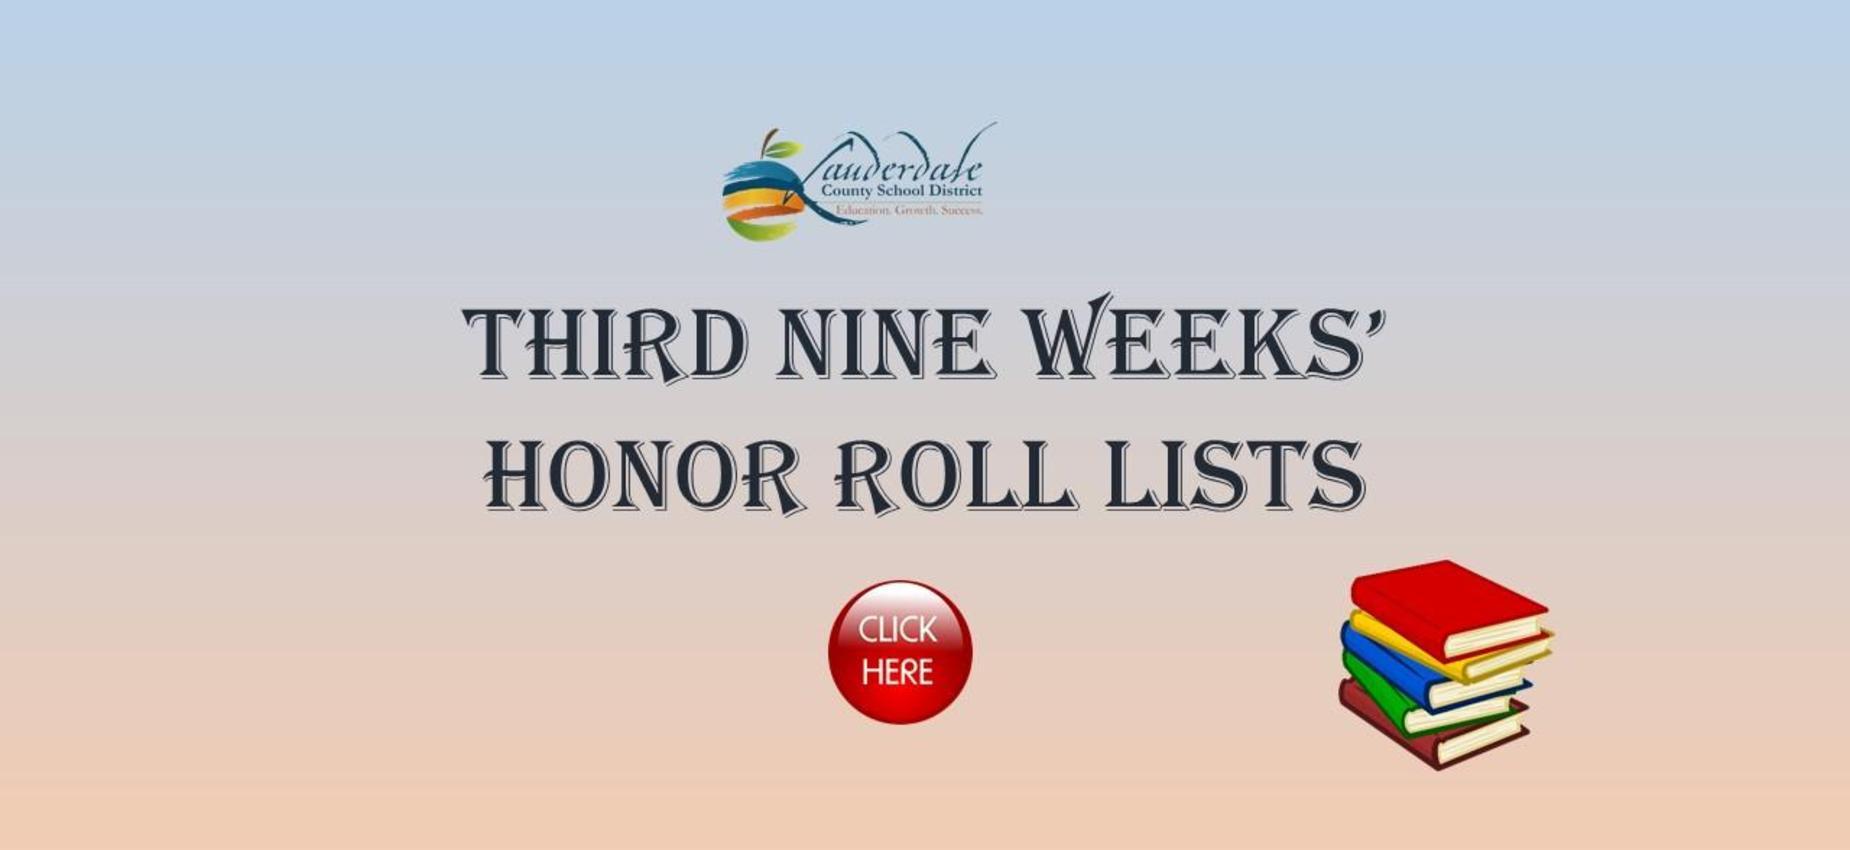 Third Nine Weeks' Honor Roll Lists